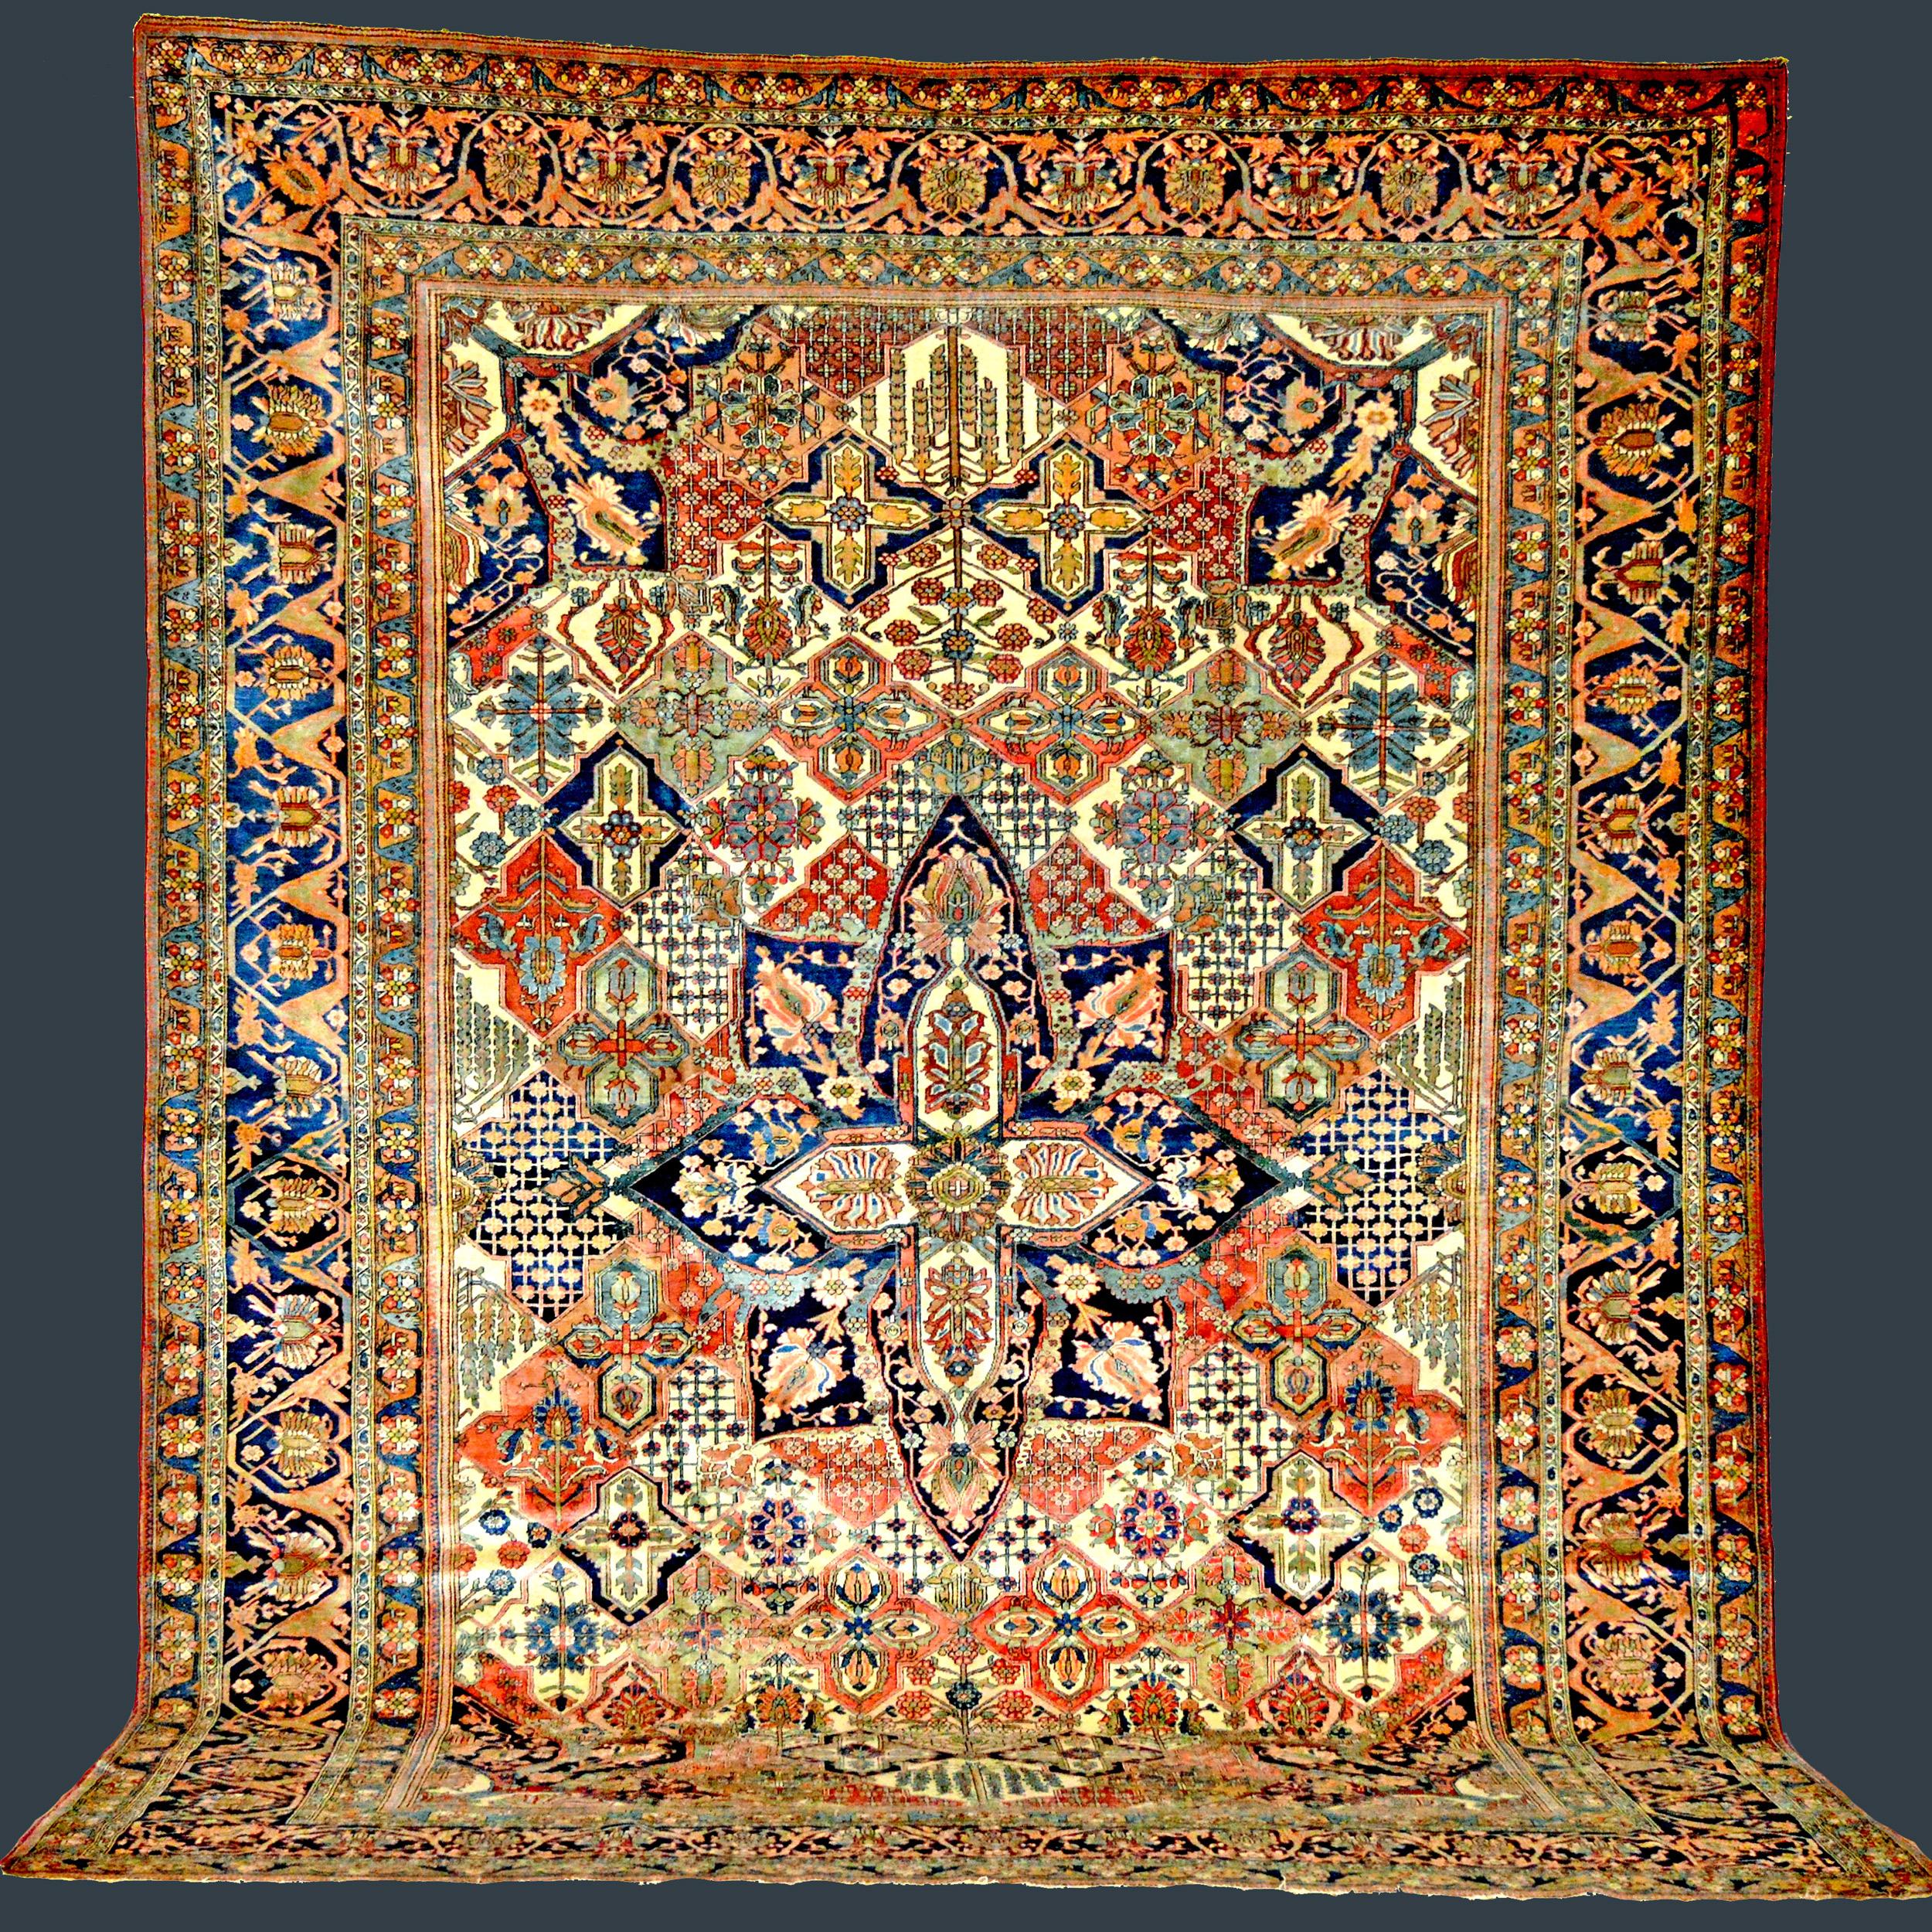 Antique Persian Mohtasham Kashan carpet with a garden panel design